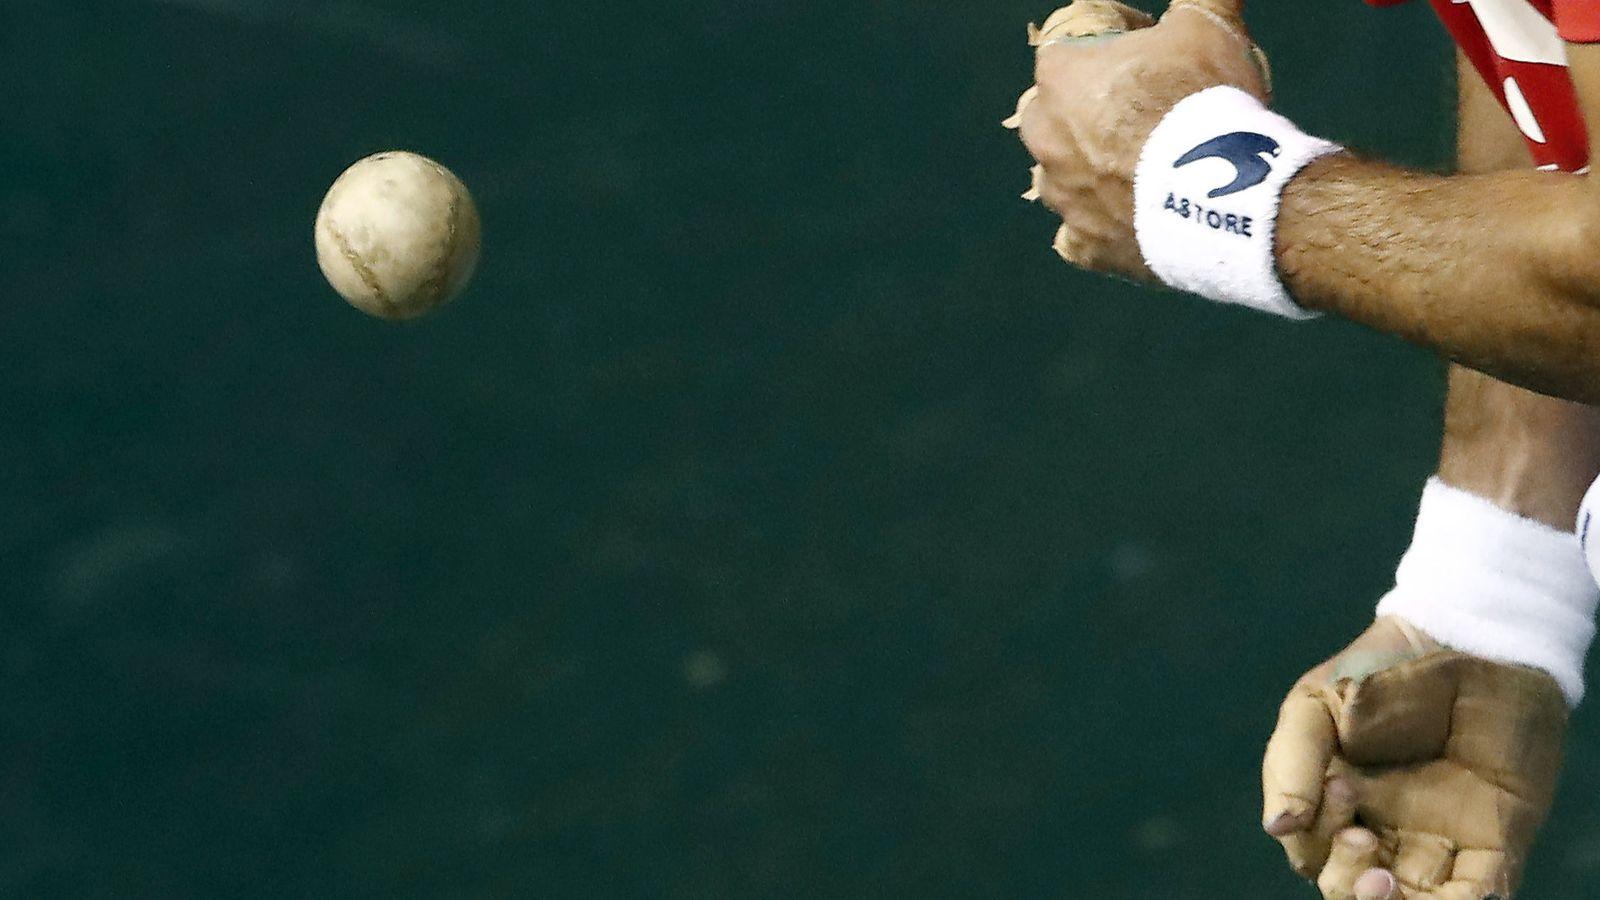 Foto: Un pelotari durante un torneo. (EFE)